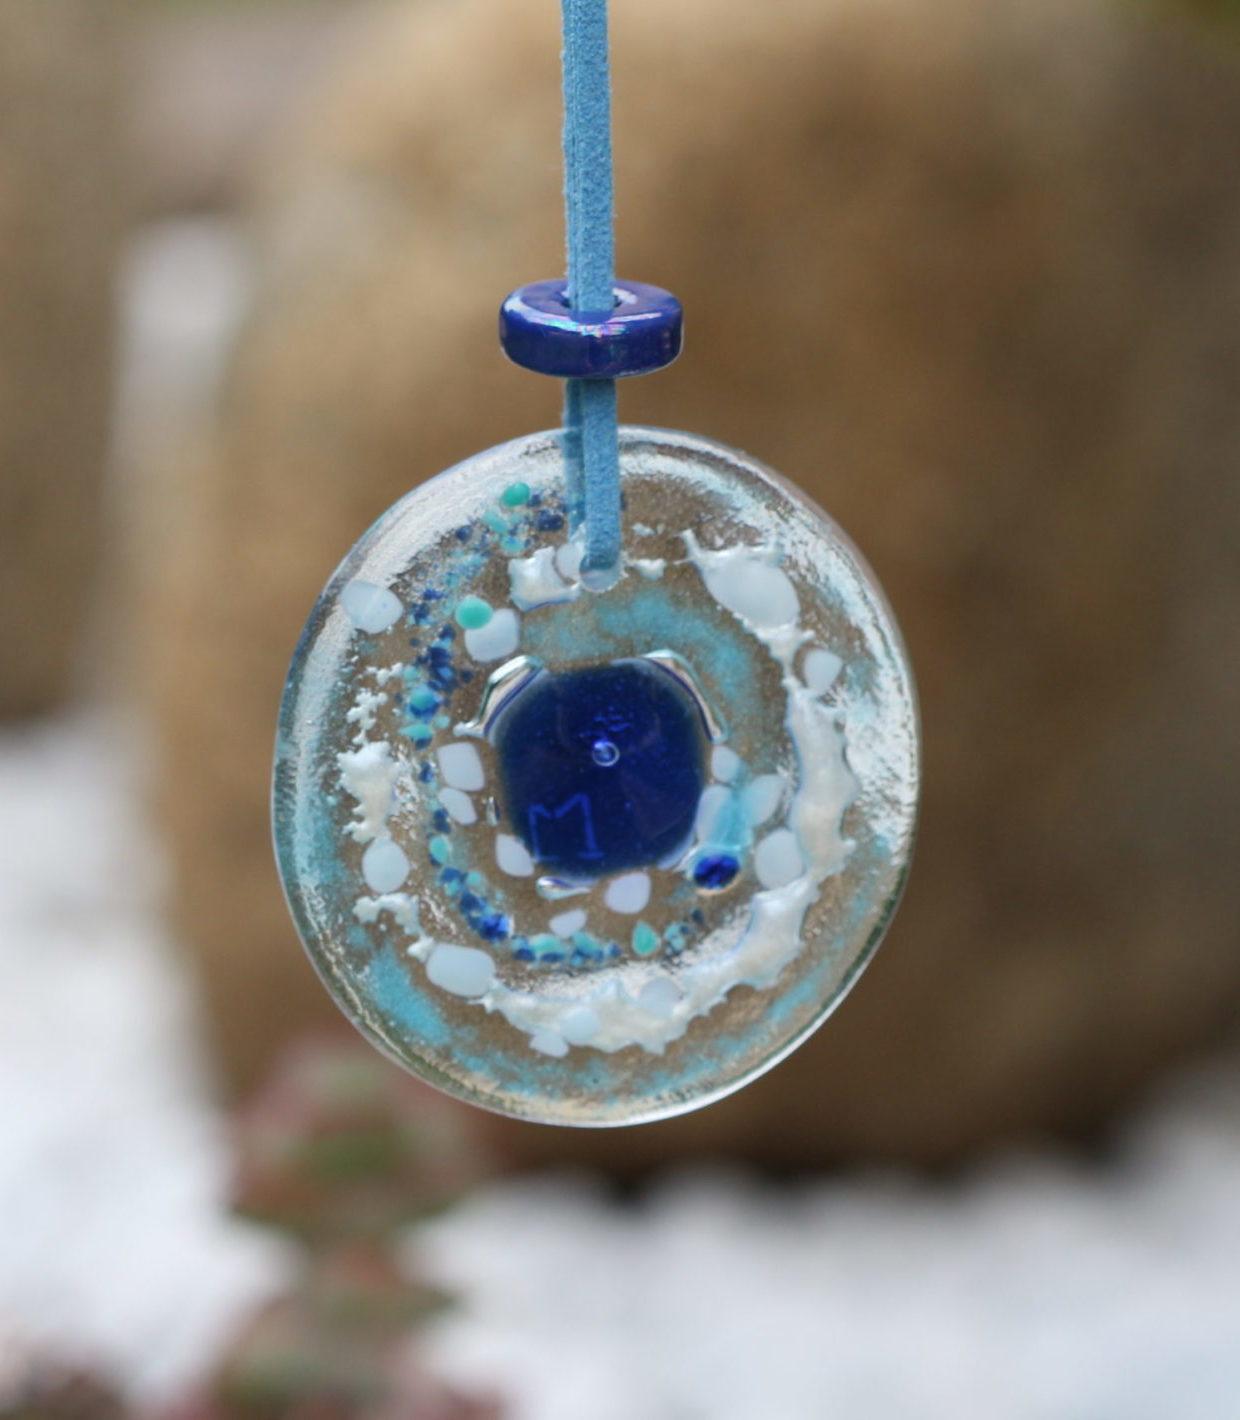 Pendentif en verre de 6 cm avec des incrustations de verre bleu et blanc